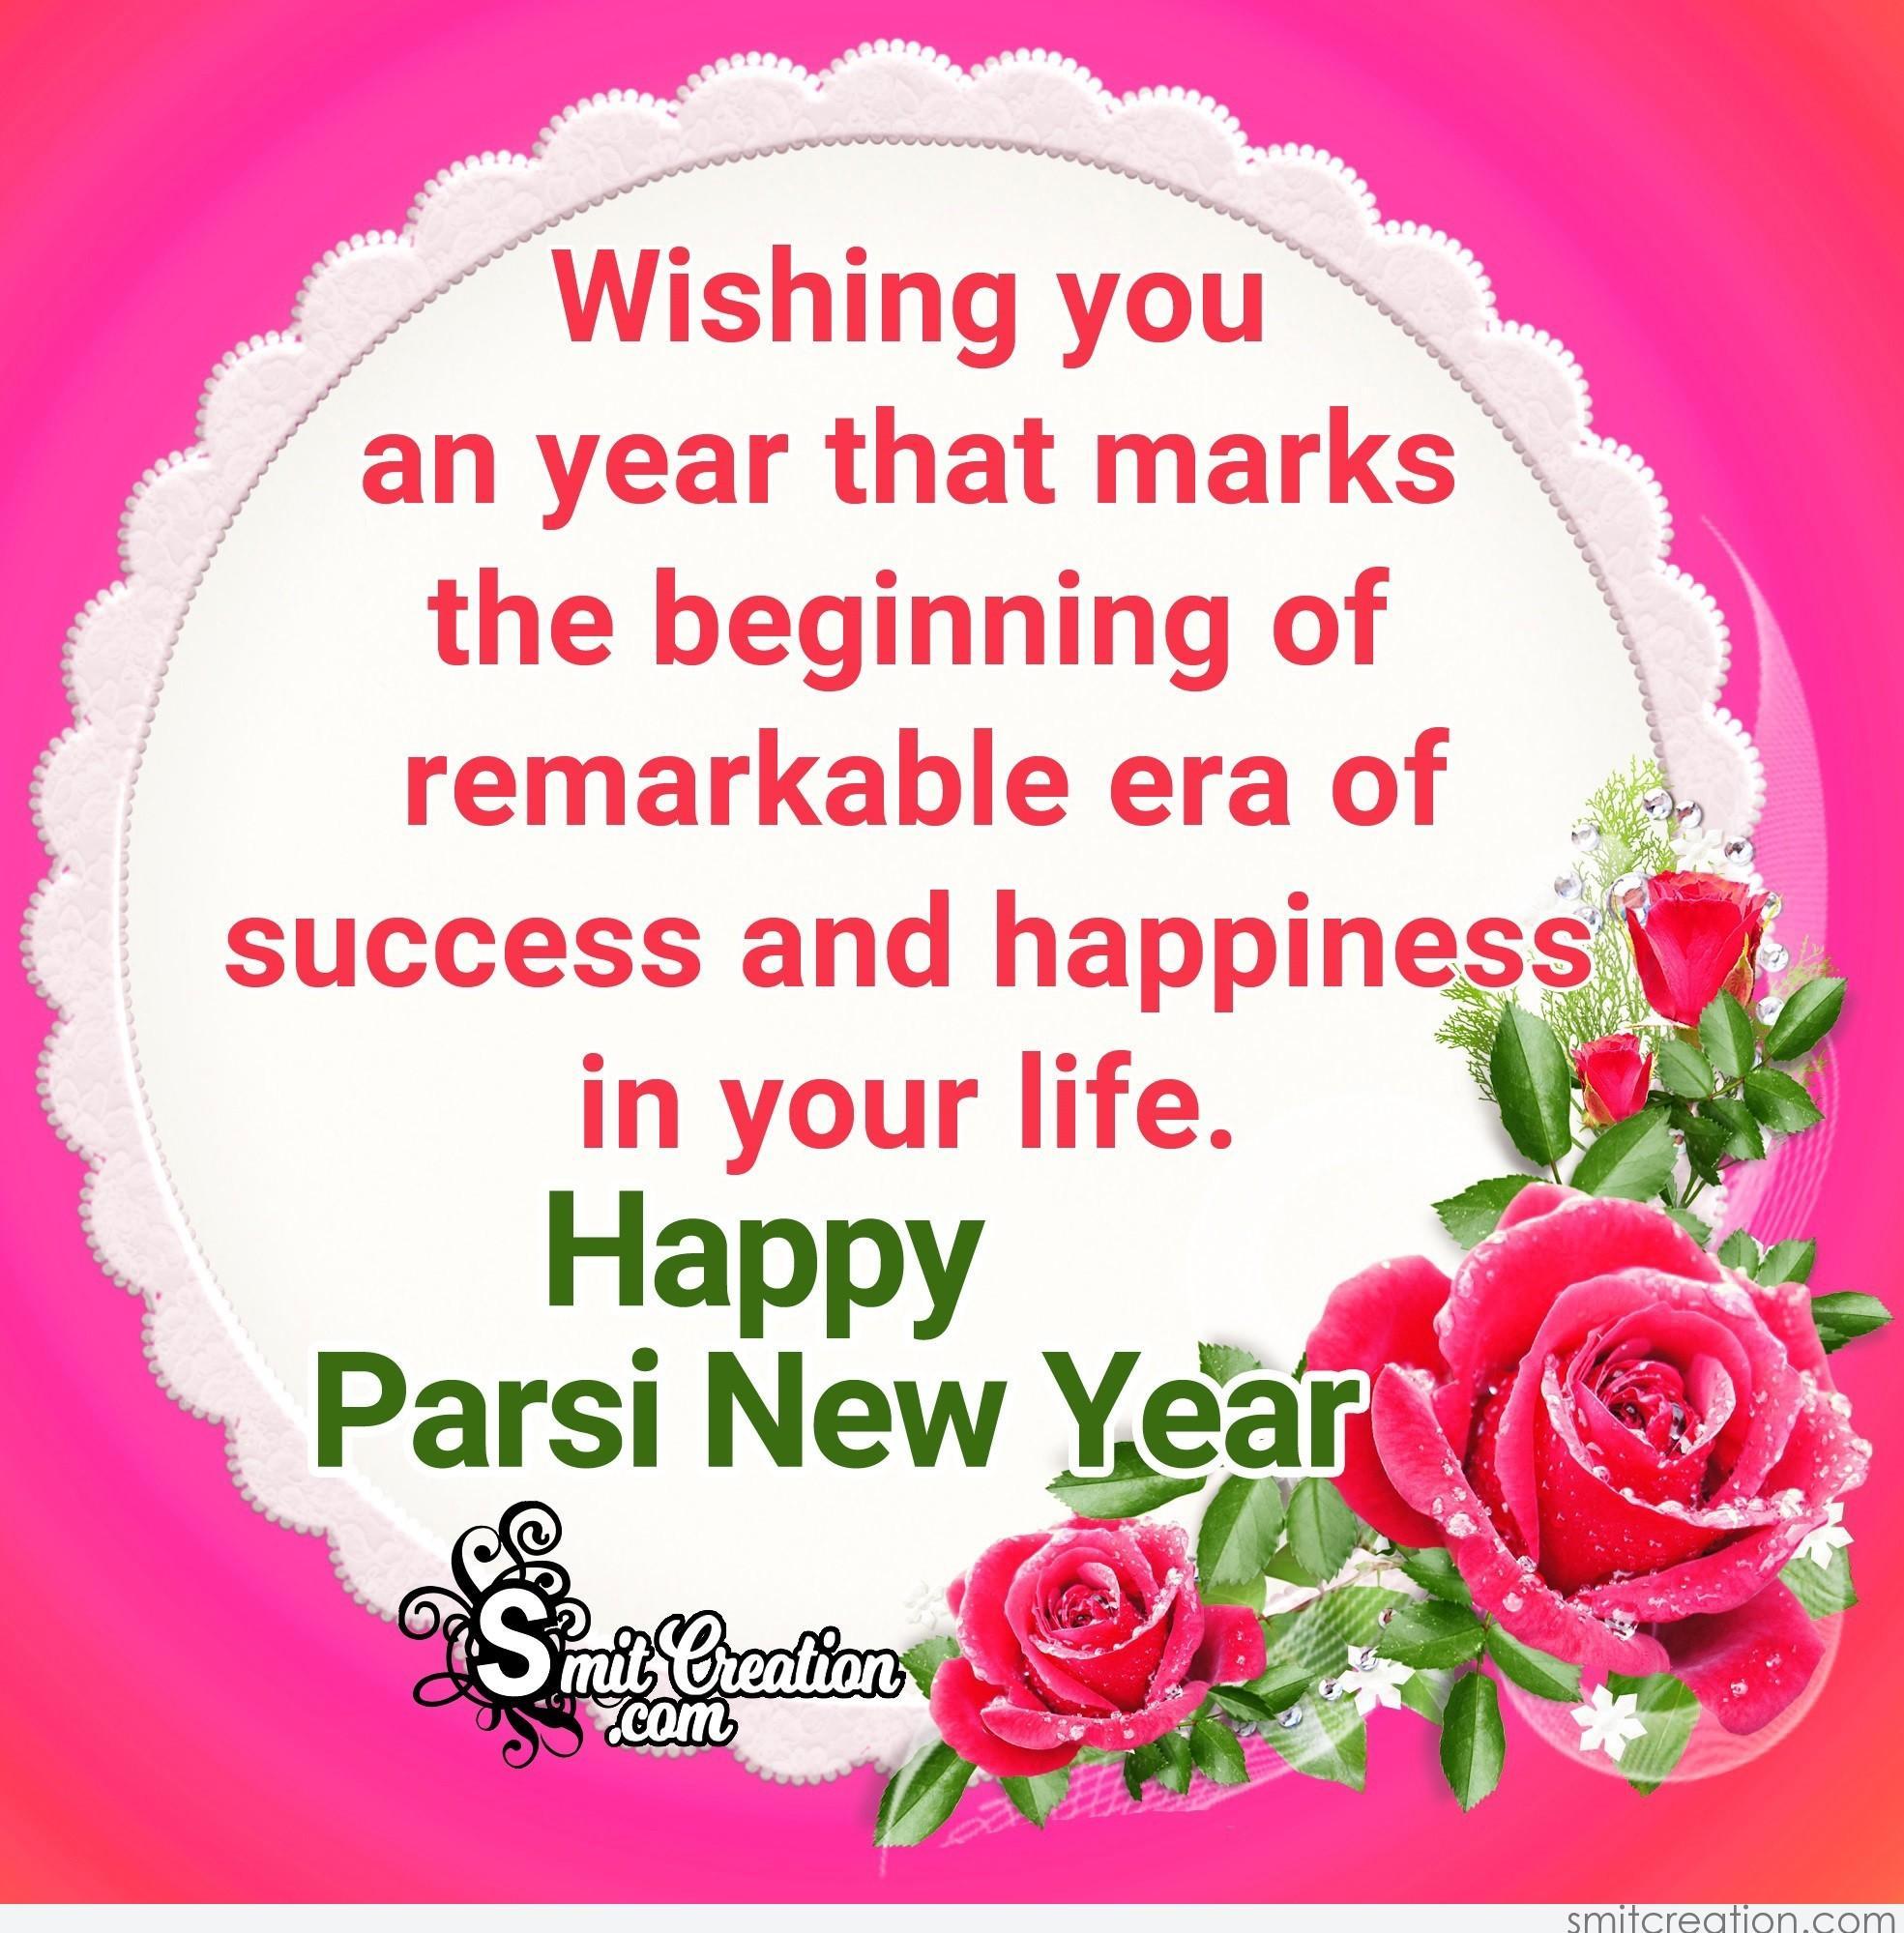 Happy Parsi New Year